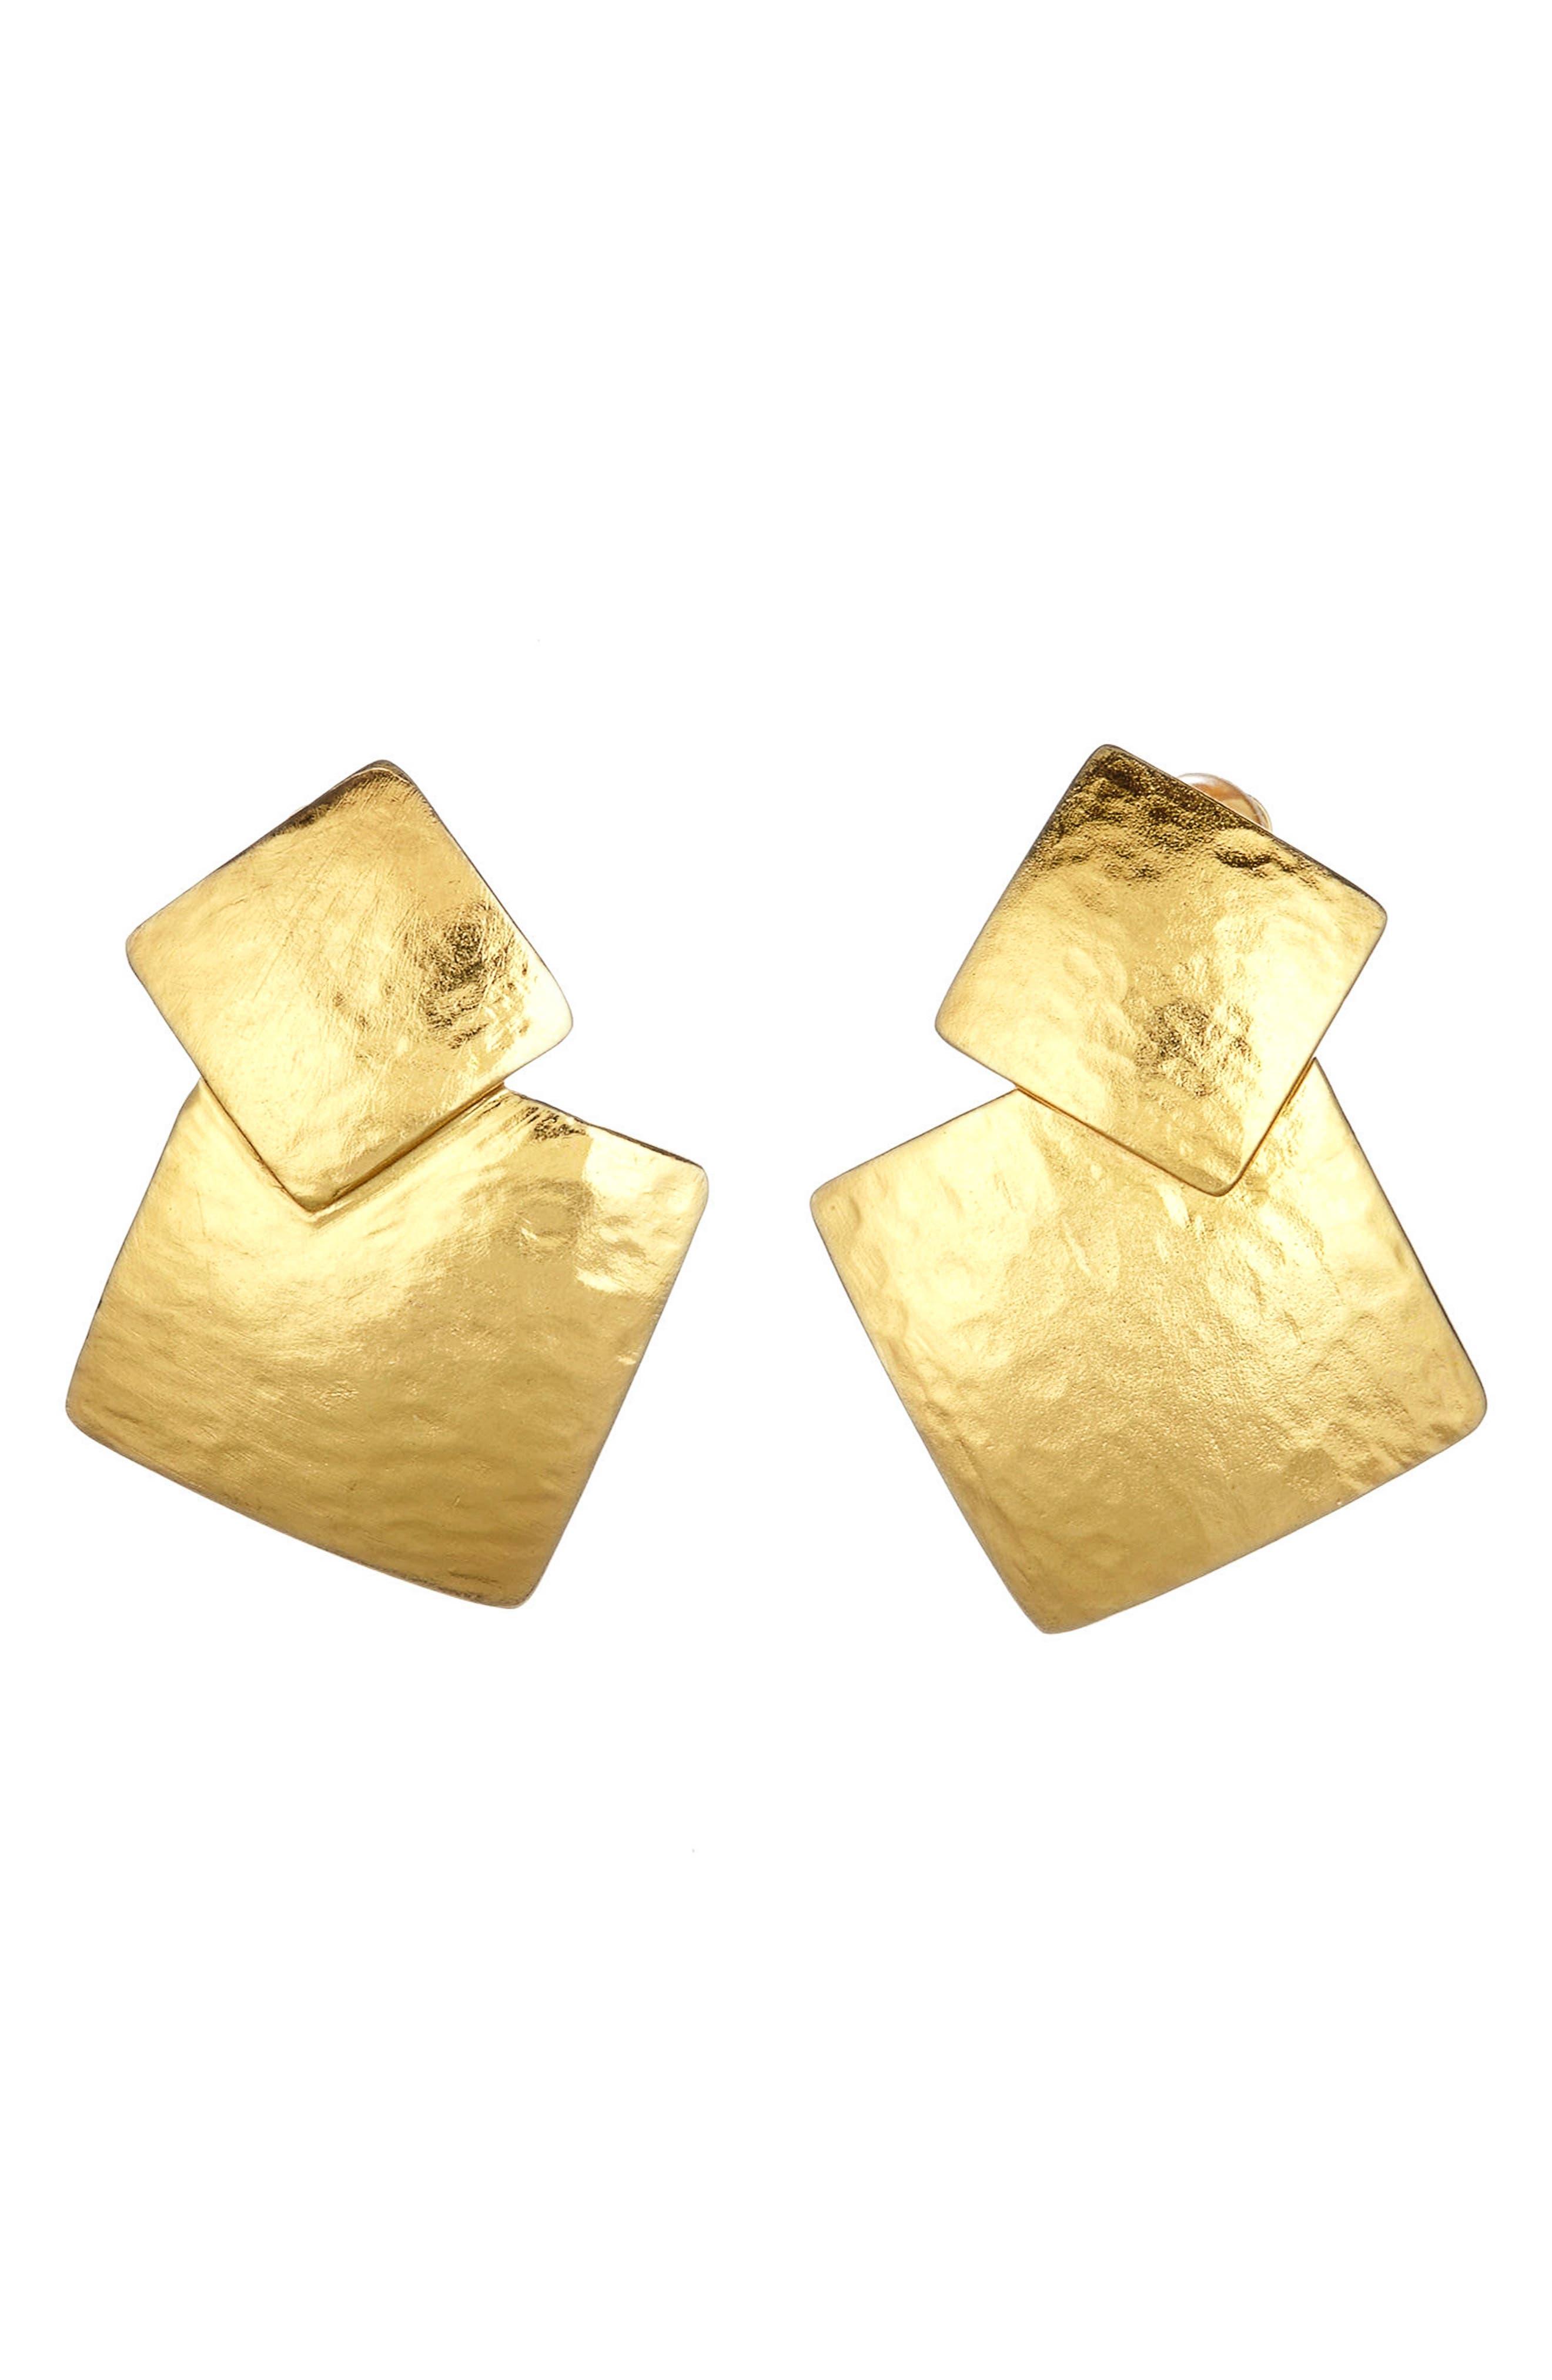 Main Image - Oscar de la Renta Geo Collage Clip Earrings